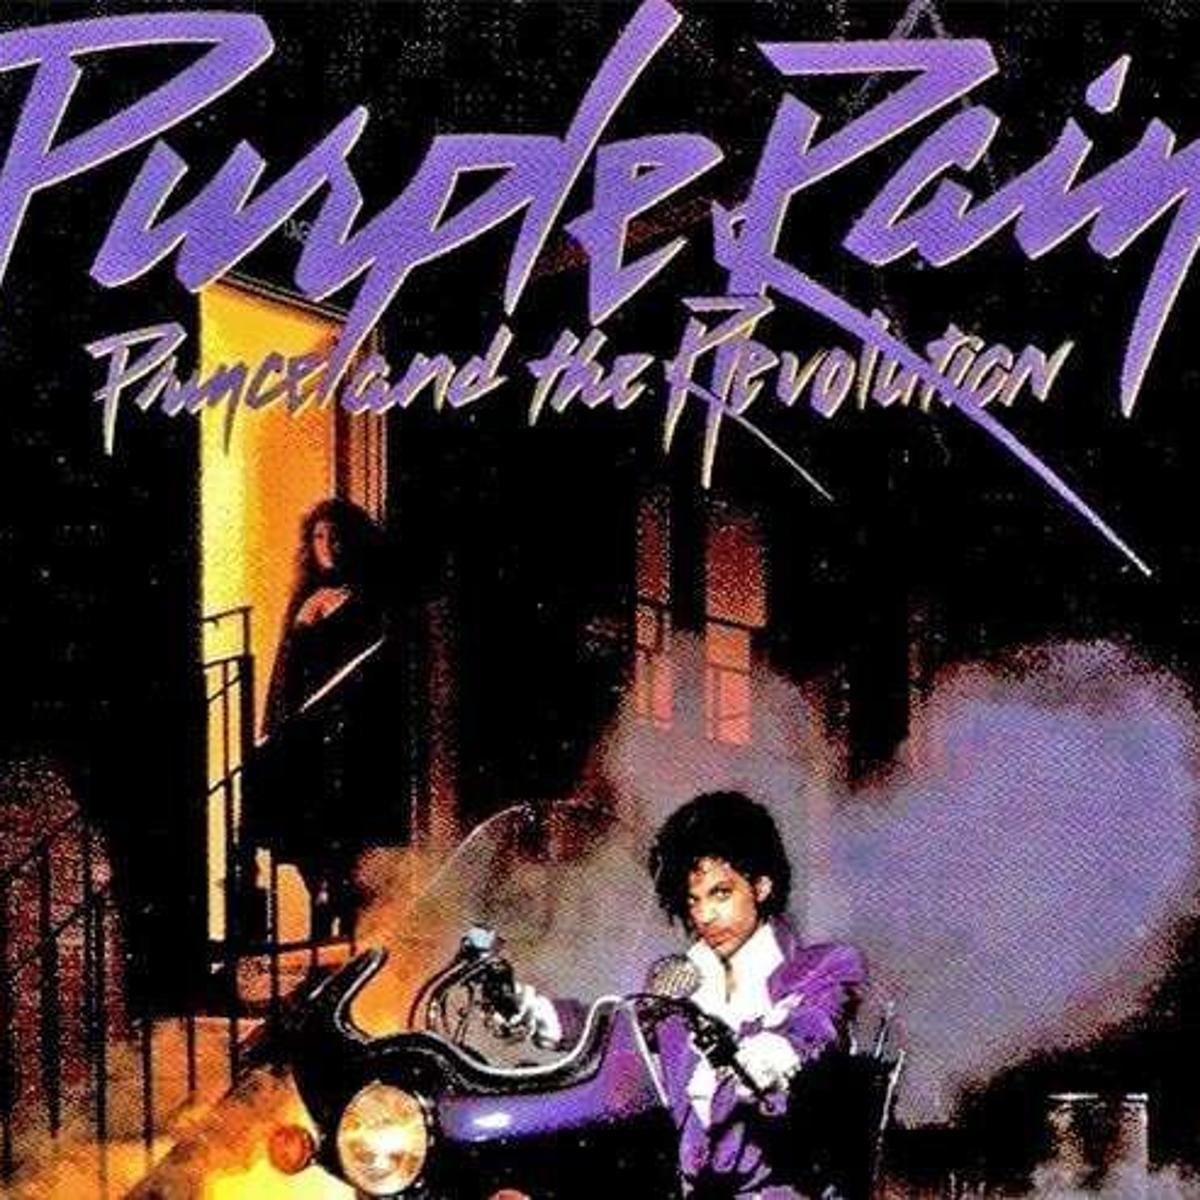 Wilma to screen 'Purple Rain' in honor of Prince | Movies